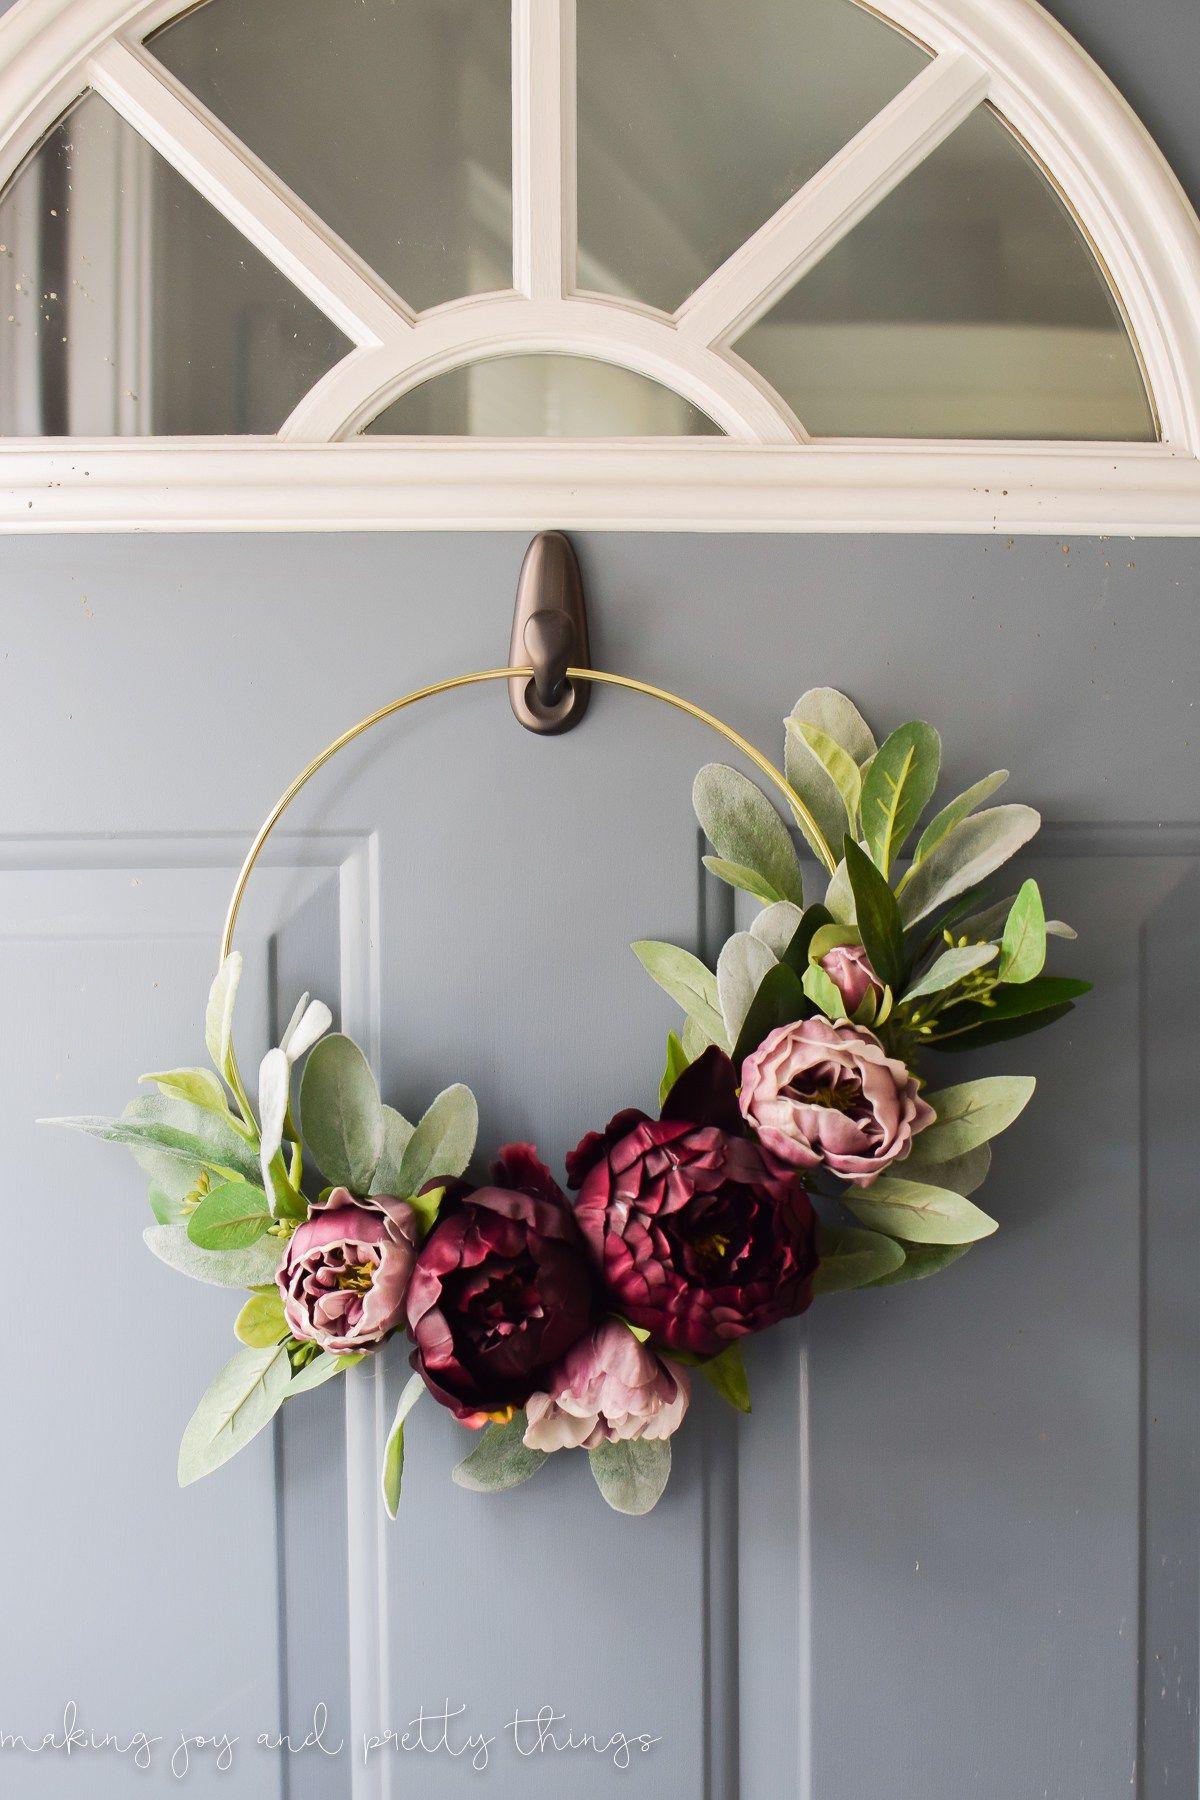 Incroyable Moody Modern Fall Wreath | Diy Fall Wreath | Diy Wreath | Minimalistic  Wreath | Modern Farmhouse | Gold Hoop Wreath